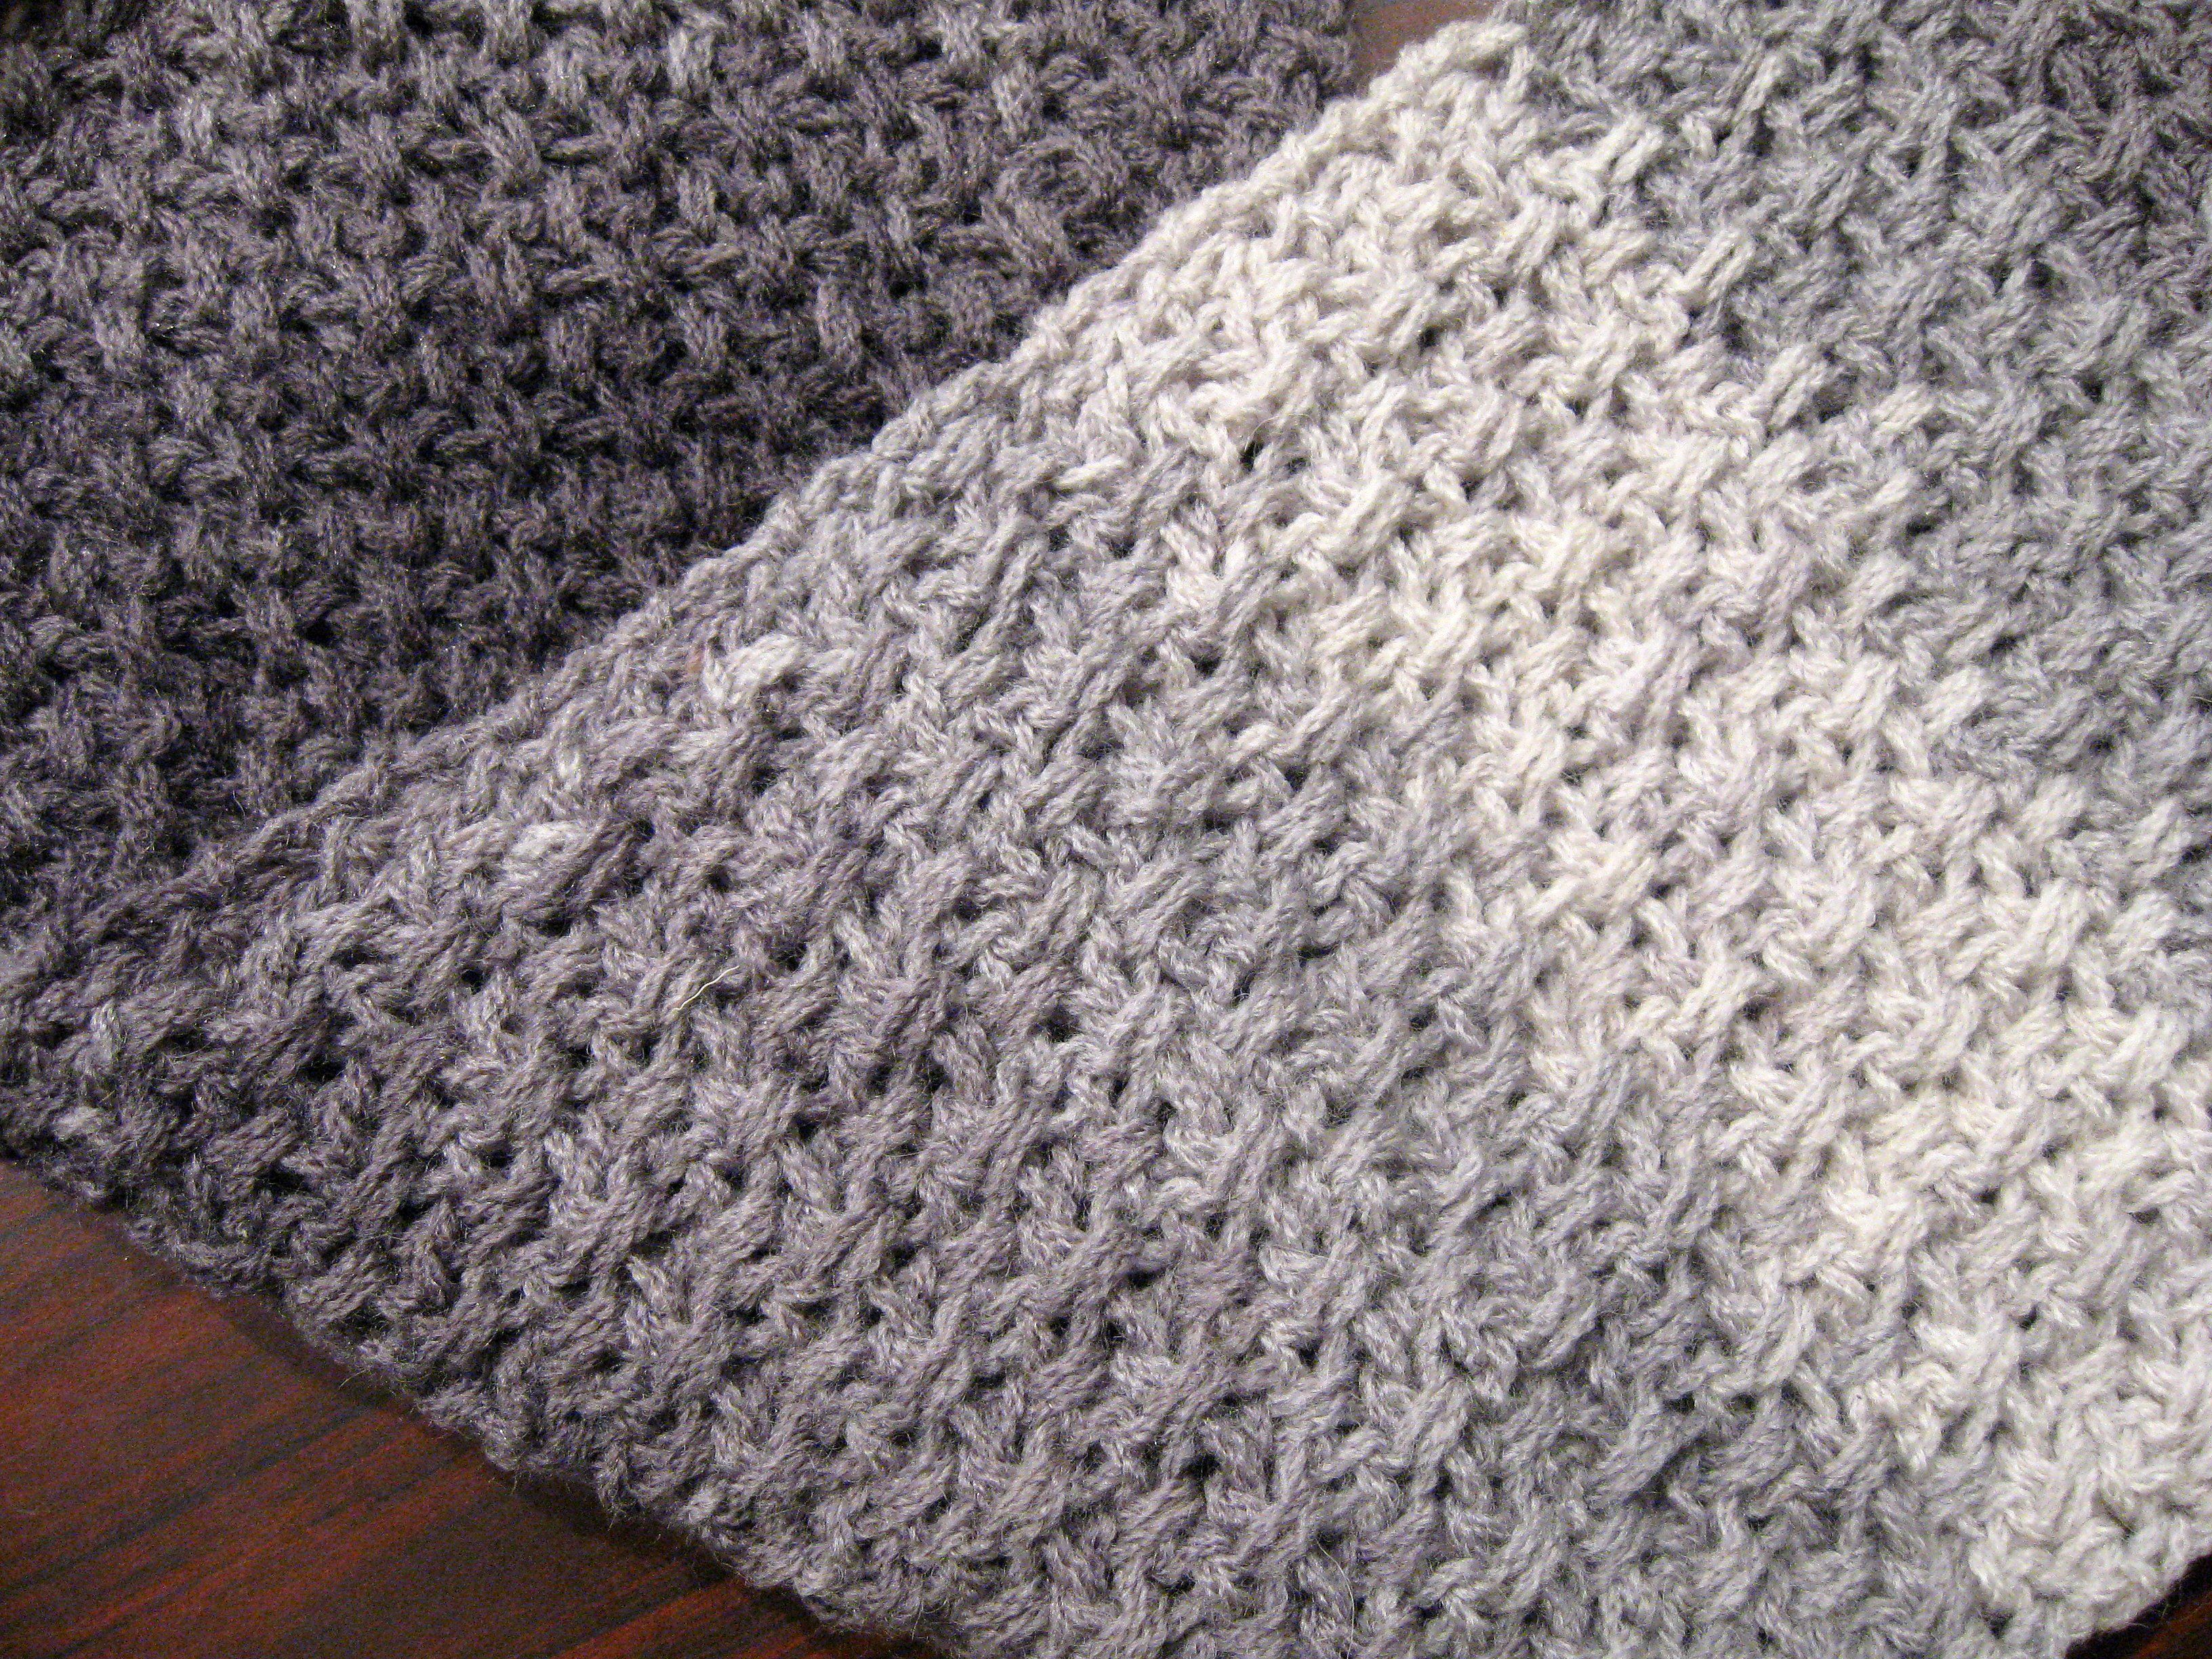 Mesh Stitch Crochet Scarf – Free Crochet Pattern | Crochet ...